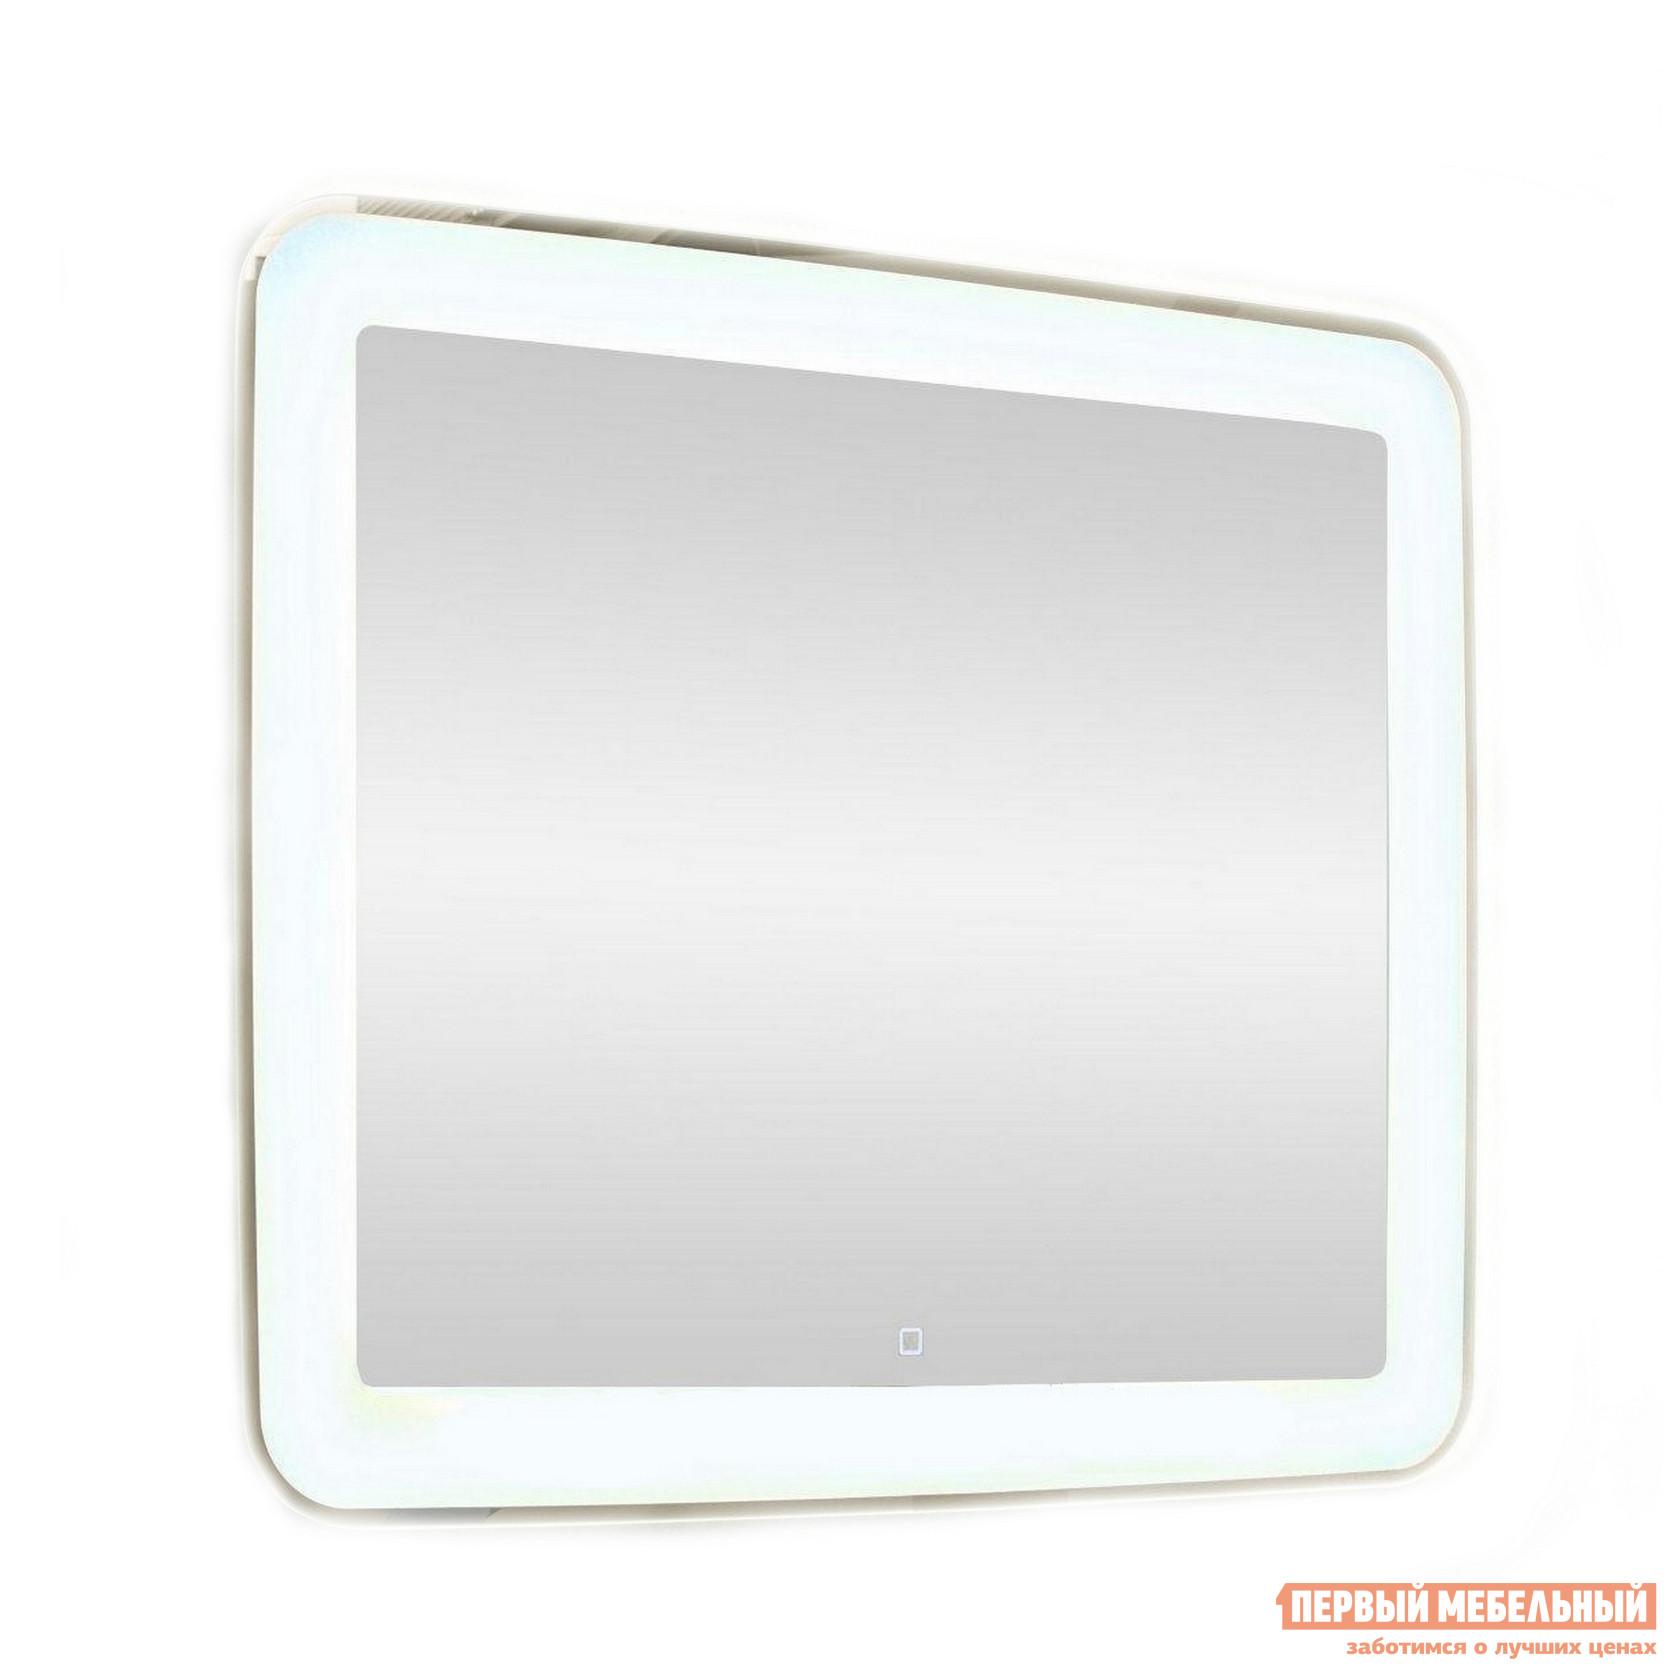 Настенное зеркало  Зеркало ЗЛП83 Velvette LED 915х685 Белый, С сенсорным выключателем, С функцией антизапотевания